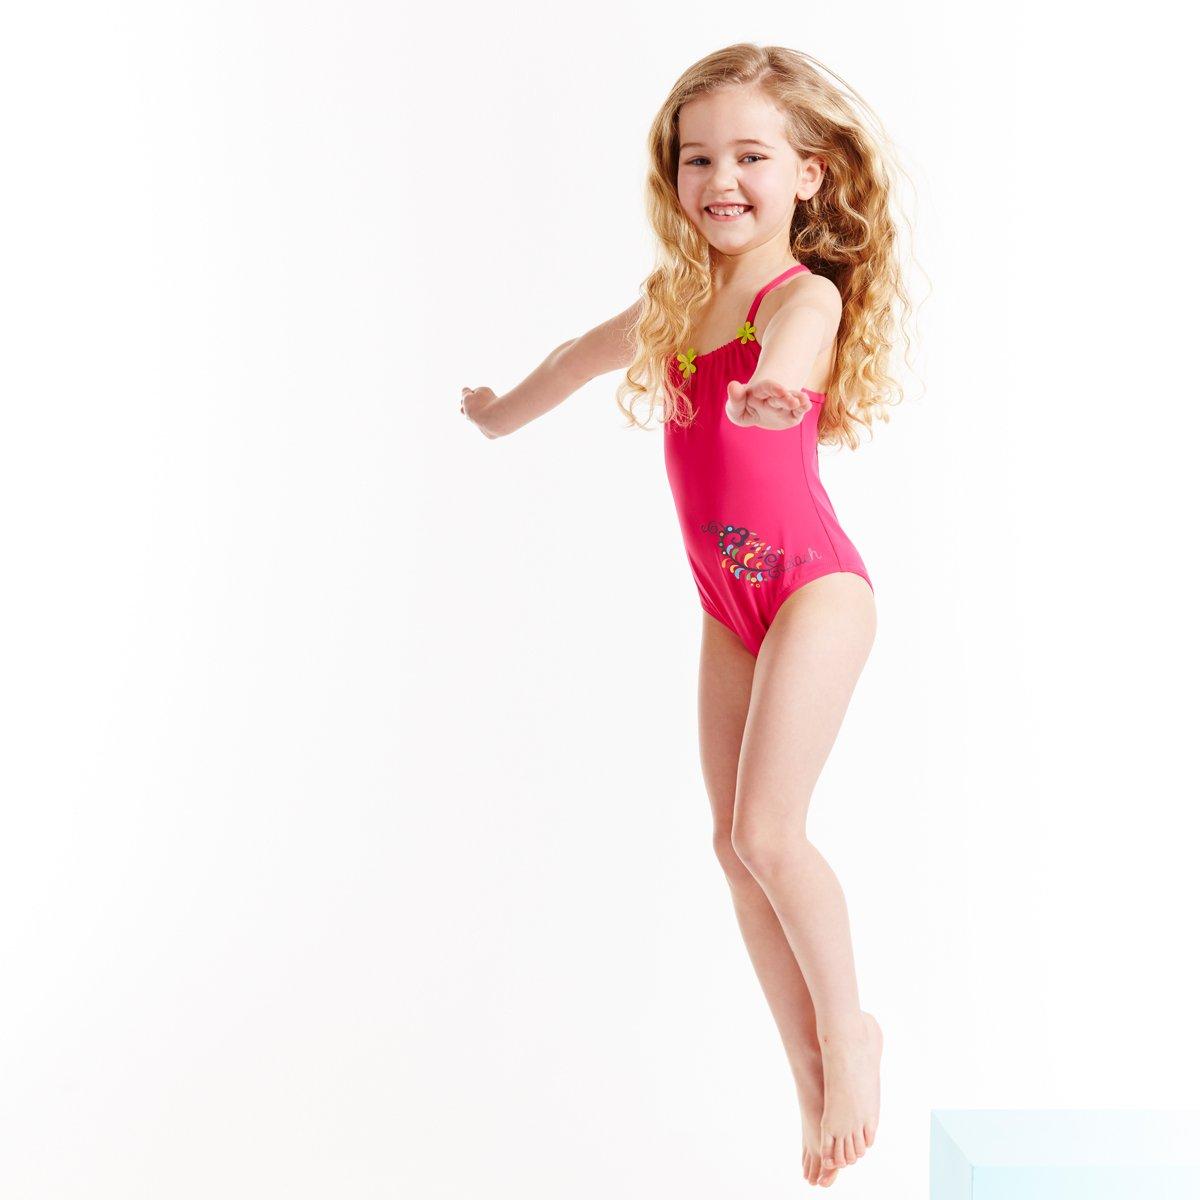 b7d0741a46804 Splash About Designer Girls Swimsuits  Amazon.co.uk  Sports   Outdoors